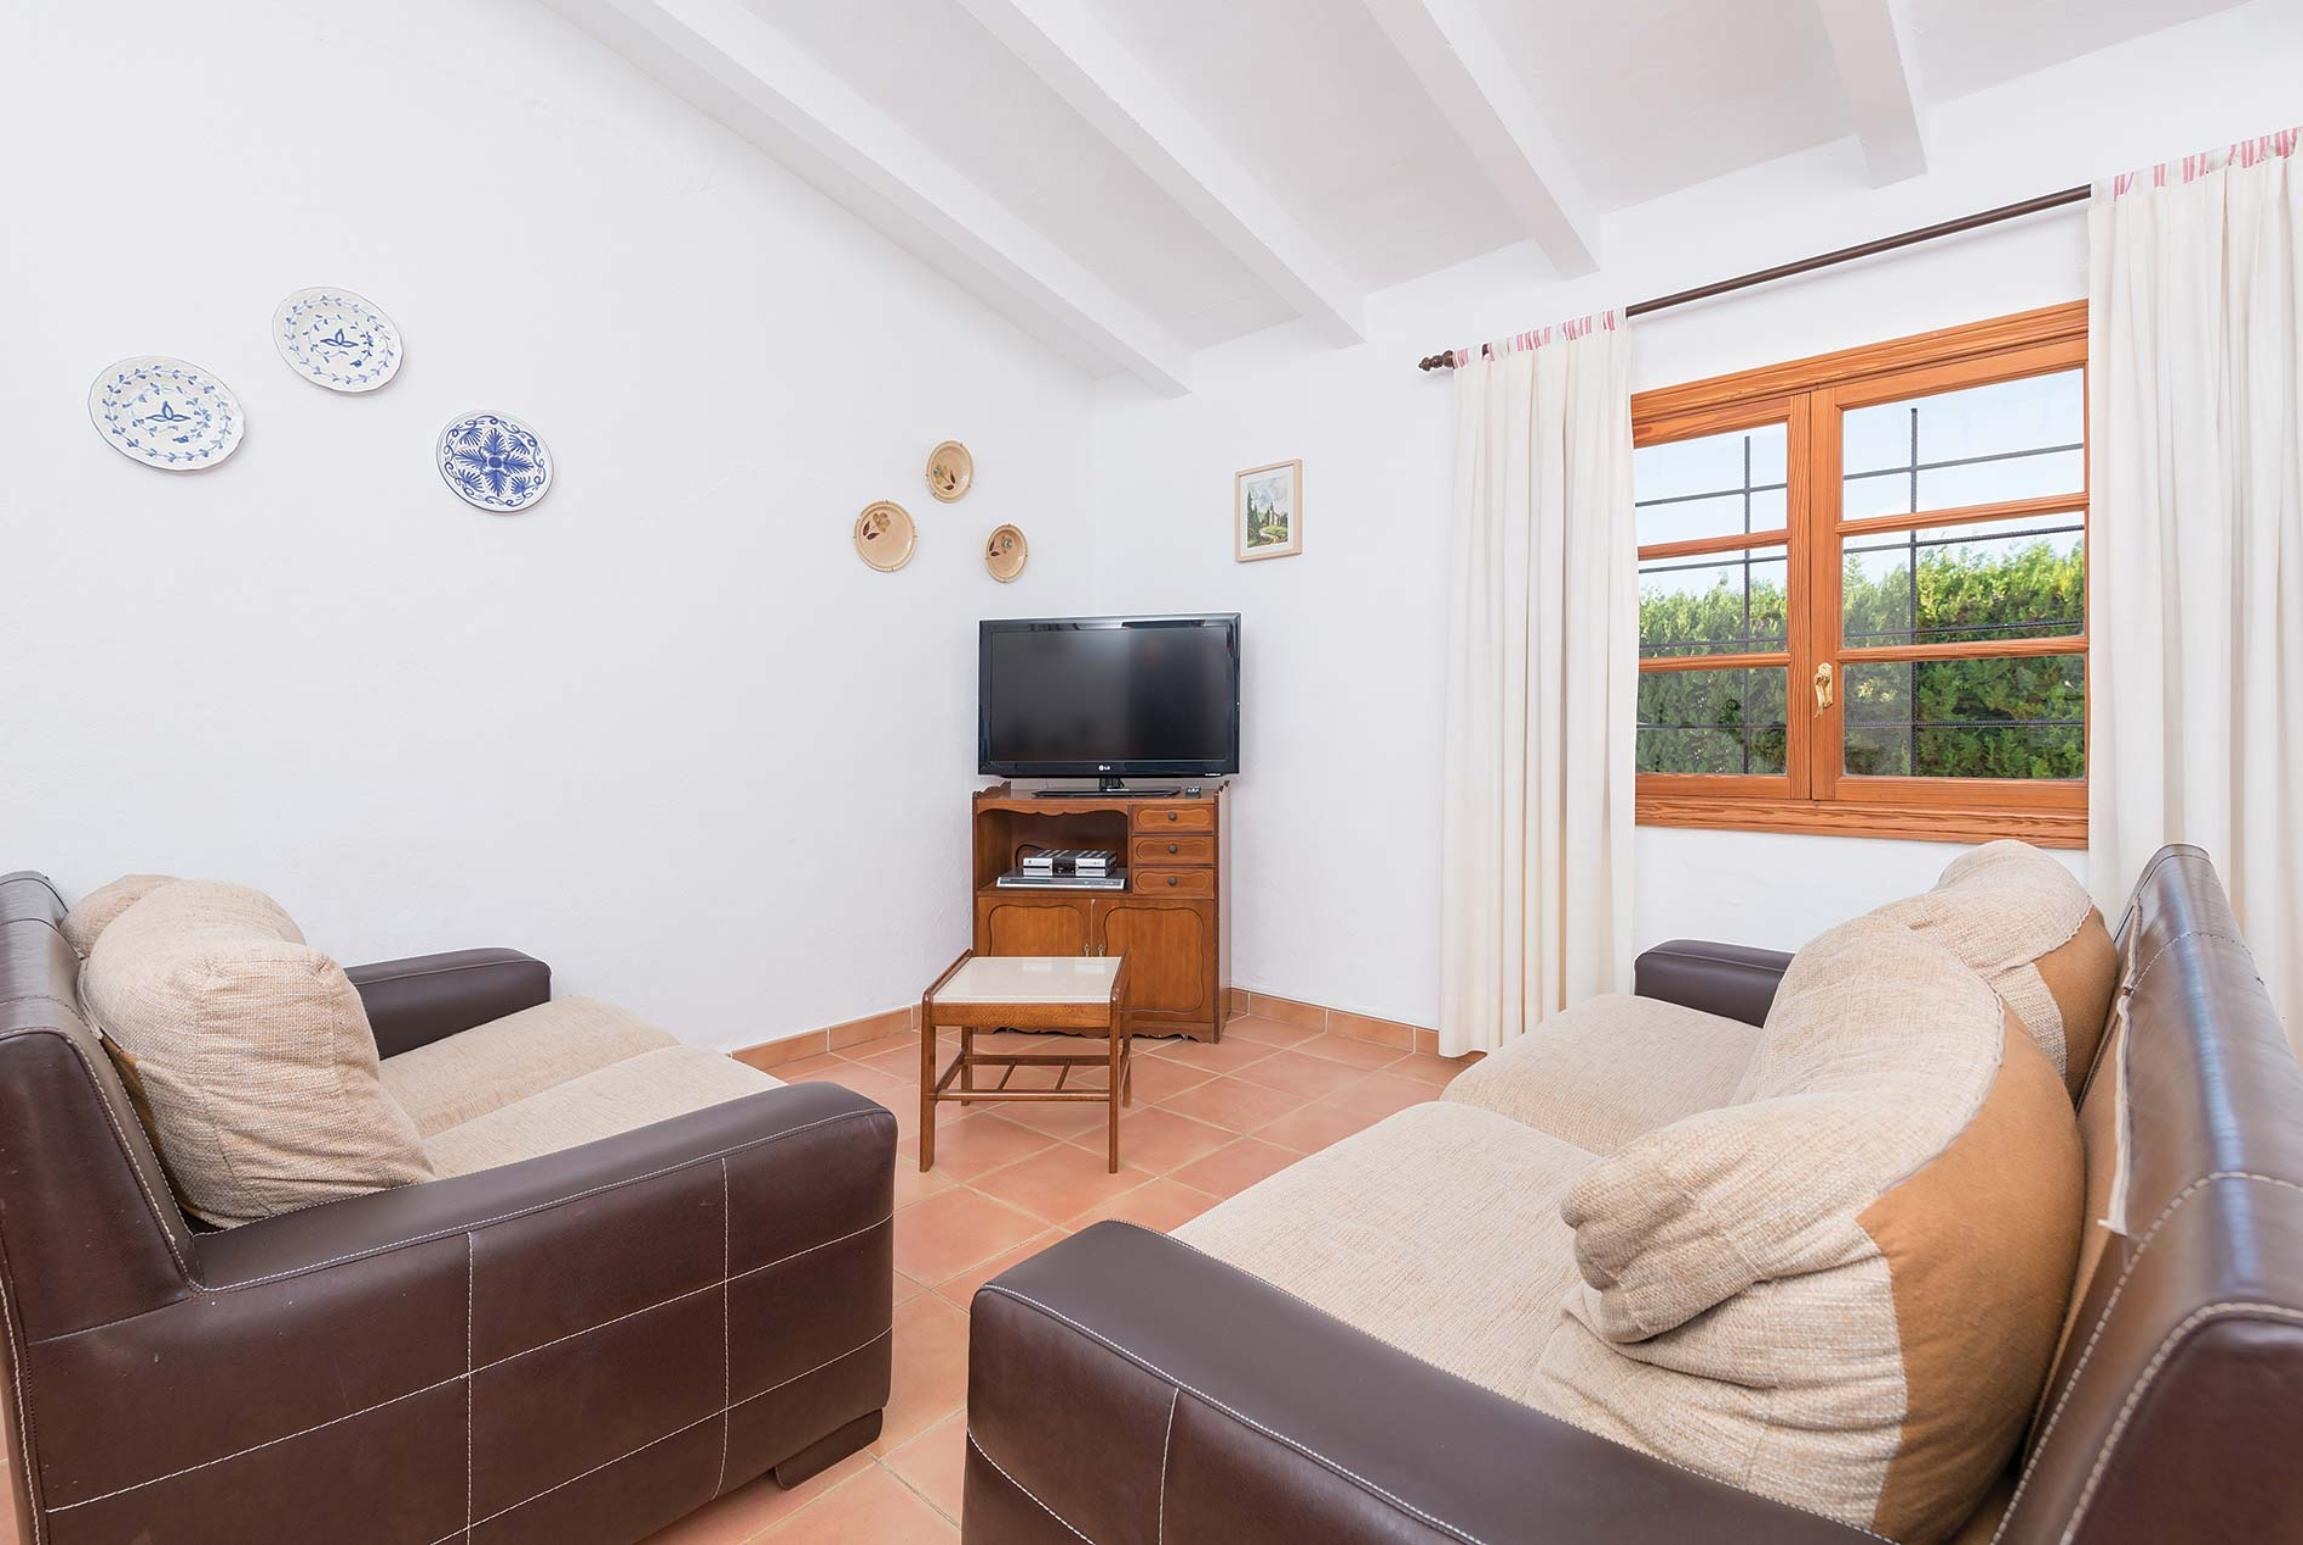 Ferienhaus Rasca (2654350), Formentor, Mallorca, Balearische Inseln, Spanien, Bild 2